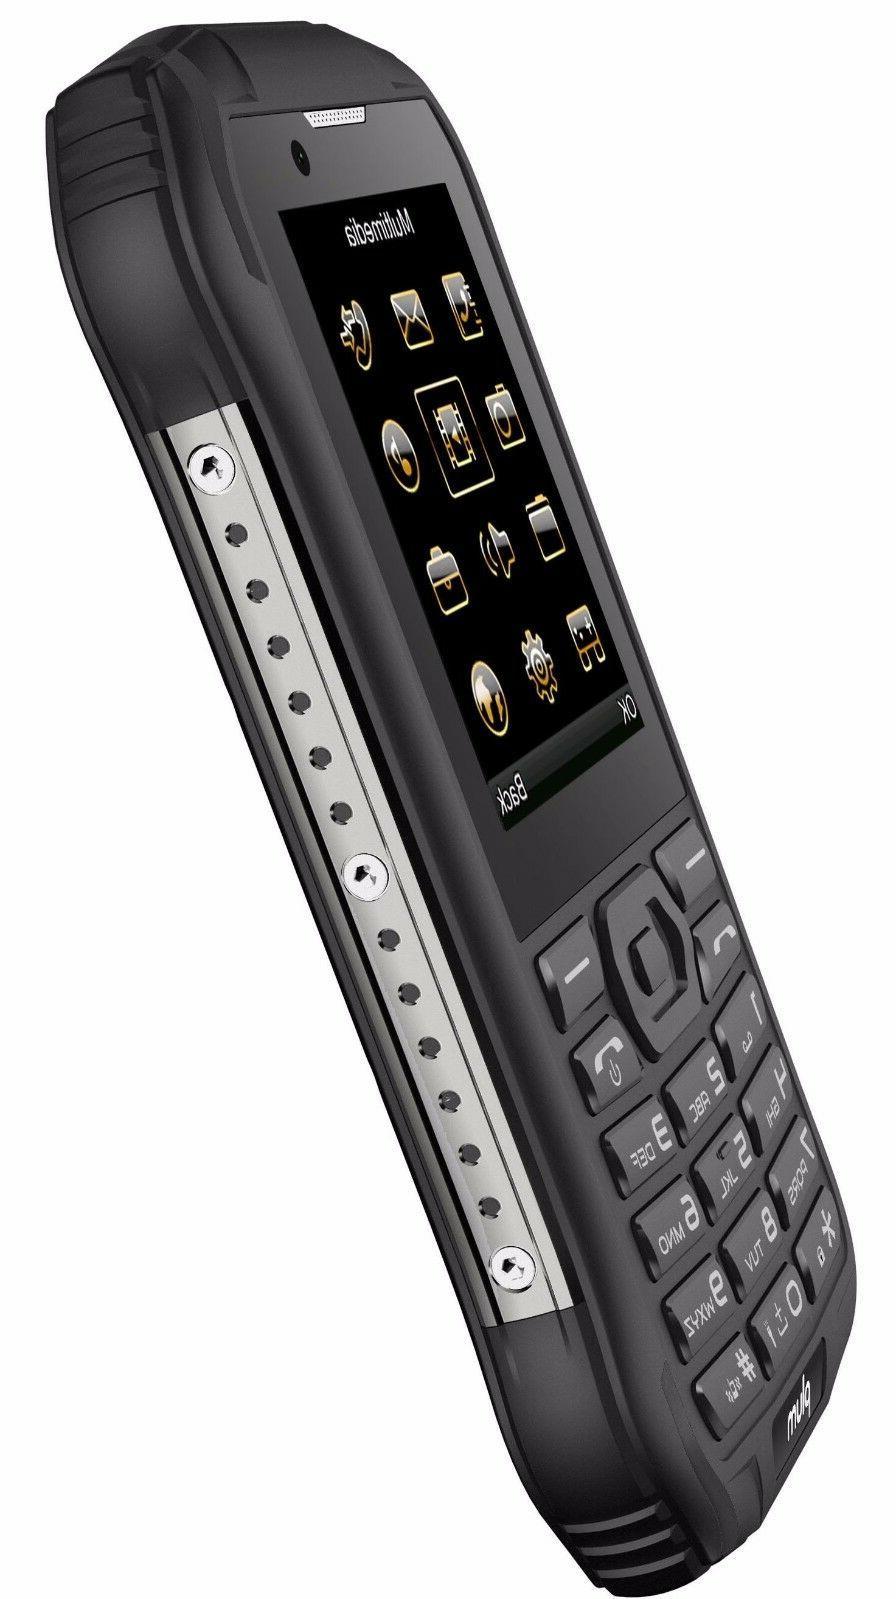 Plum Ram 7 Rugged Cell Phone Unlocked ATT MetroPCS Simple